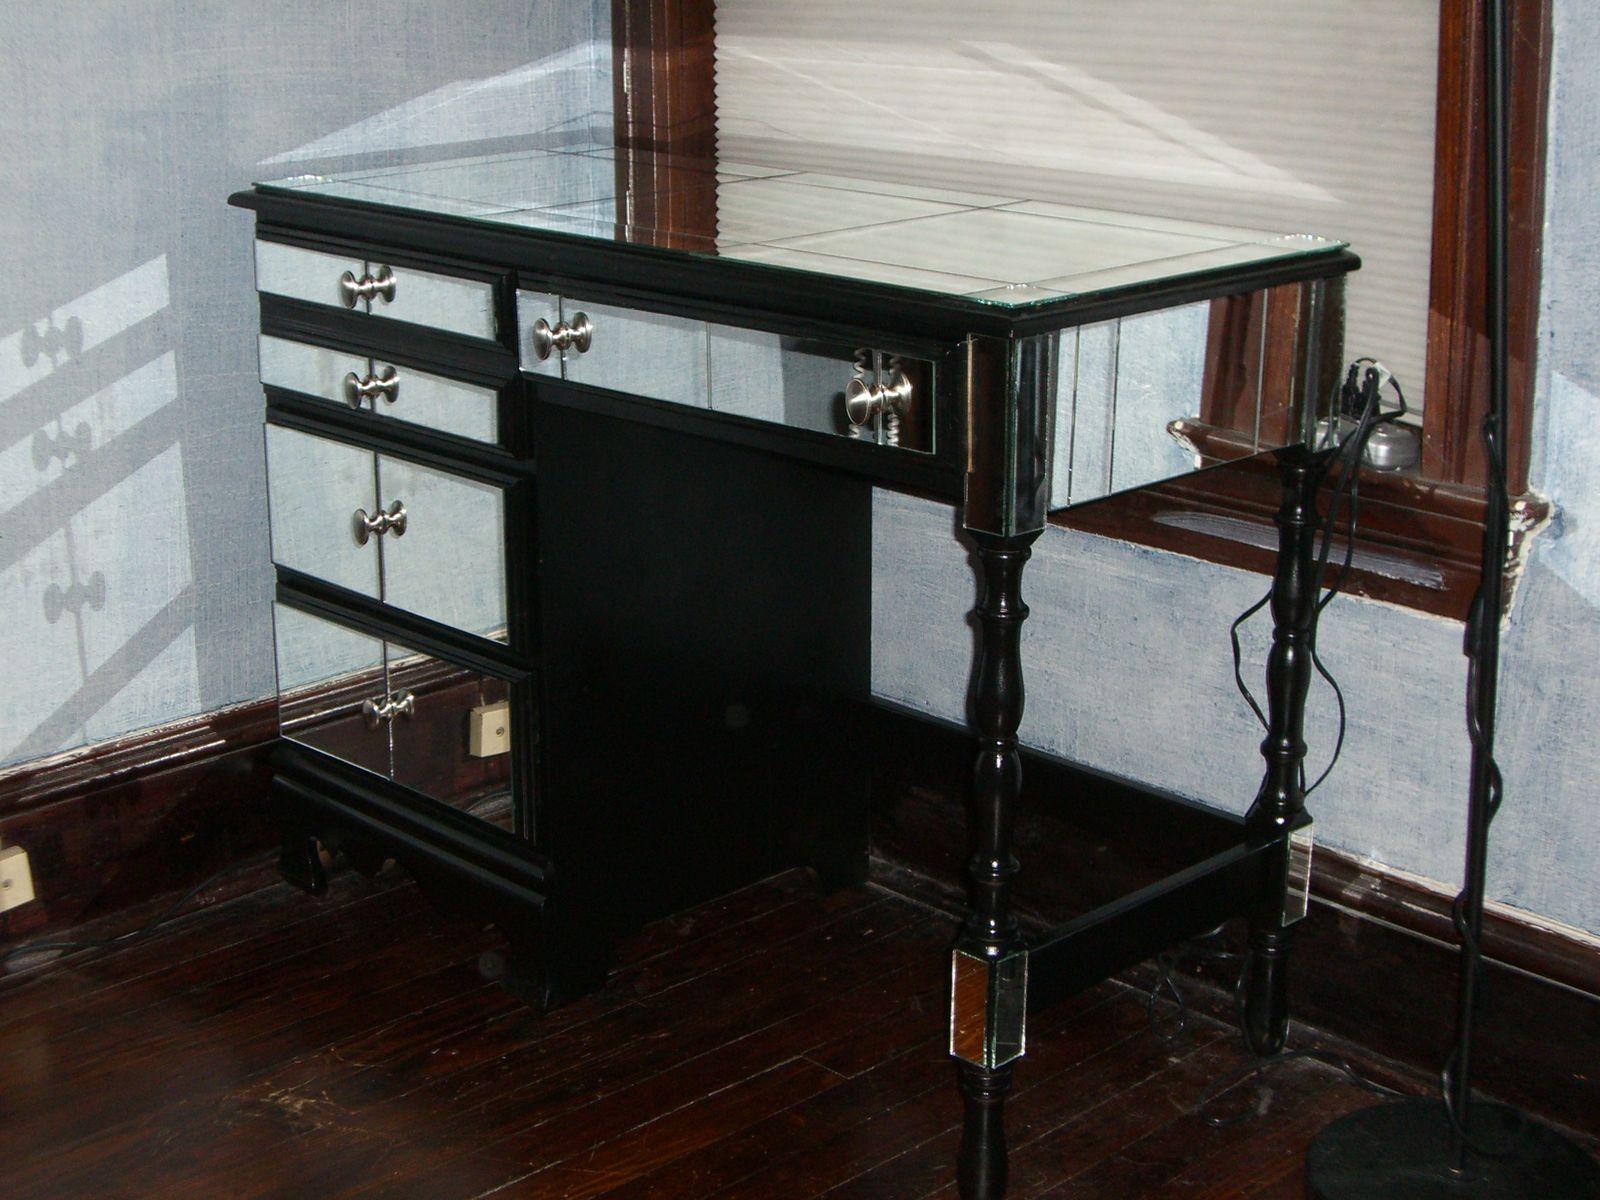 Mirrored Vanity Desk IKEA Hackers IKEA Hackers